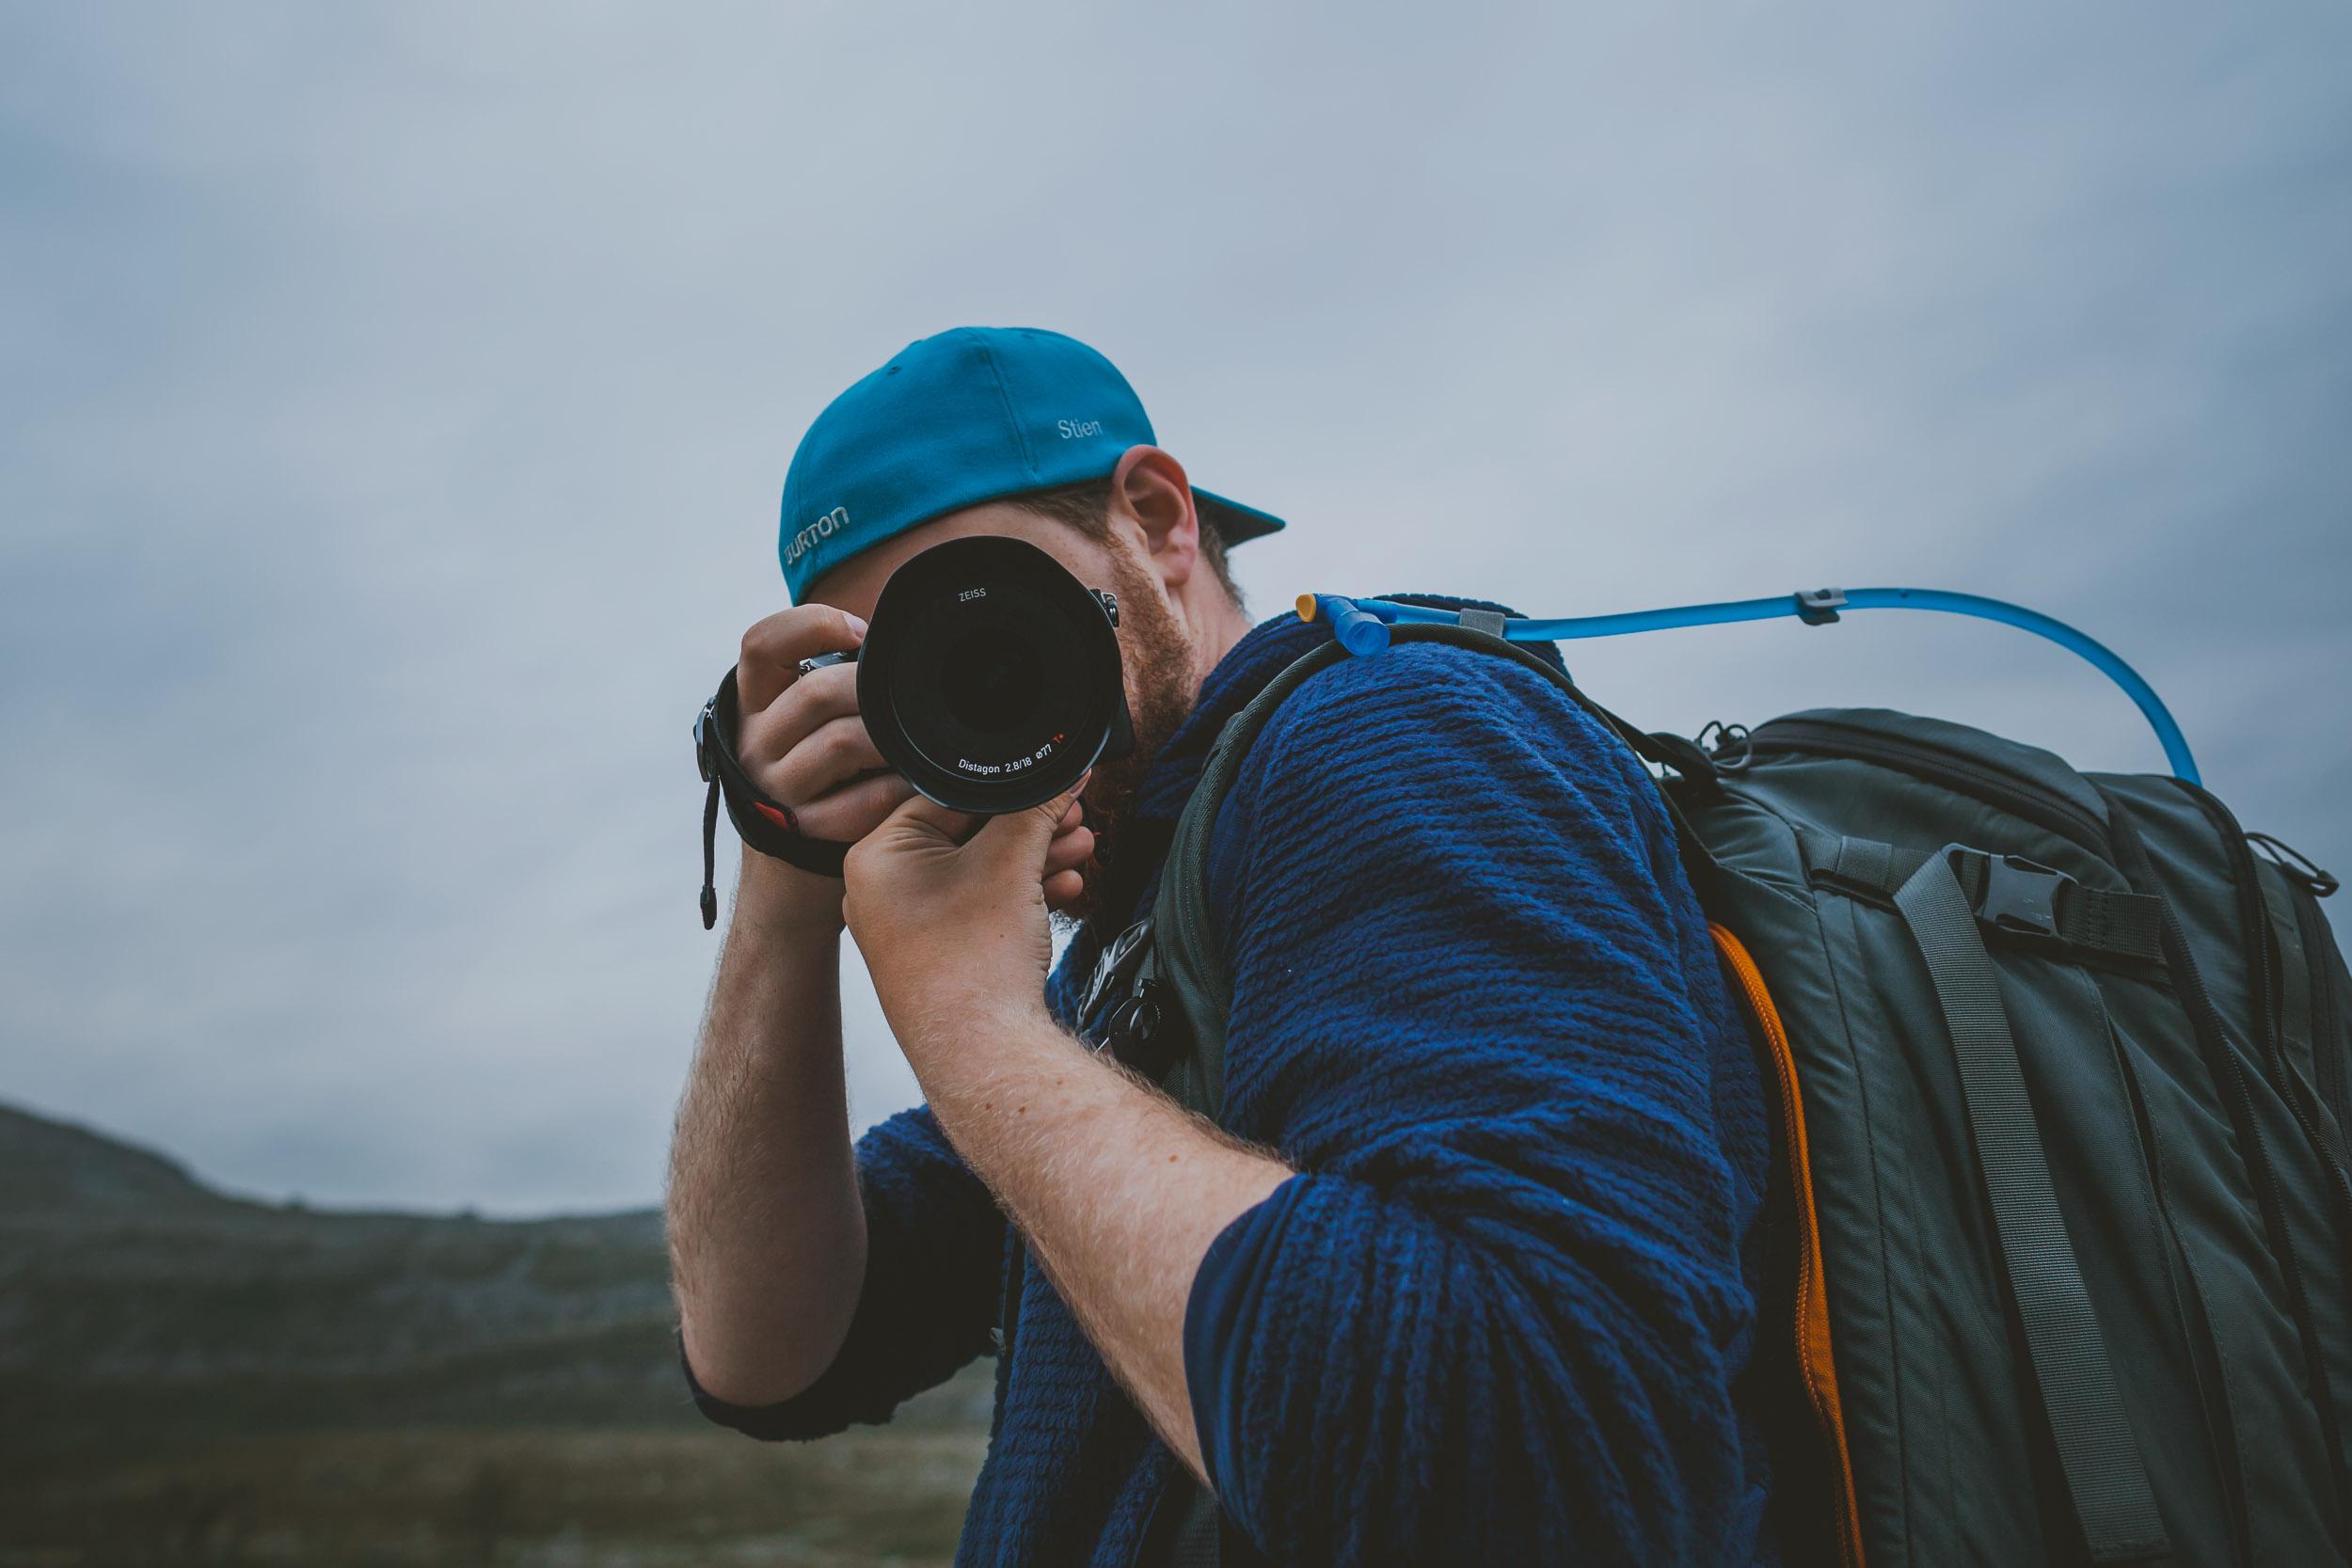 Mann som fotograferer med Sony kamera